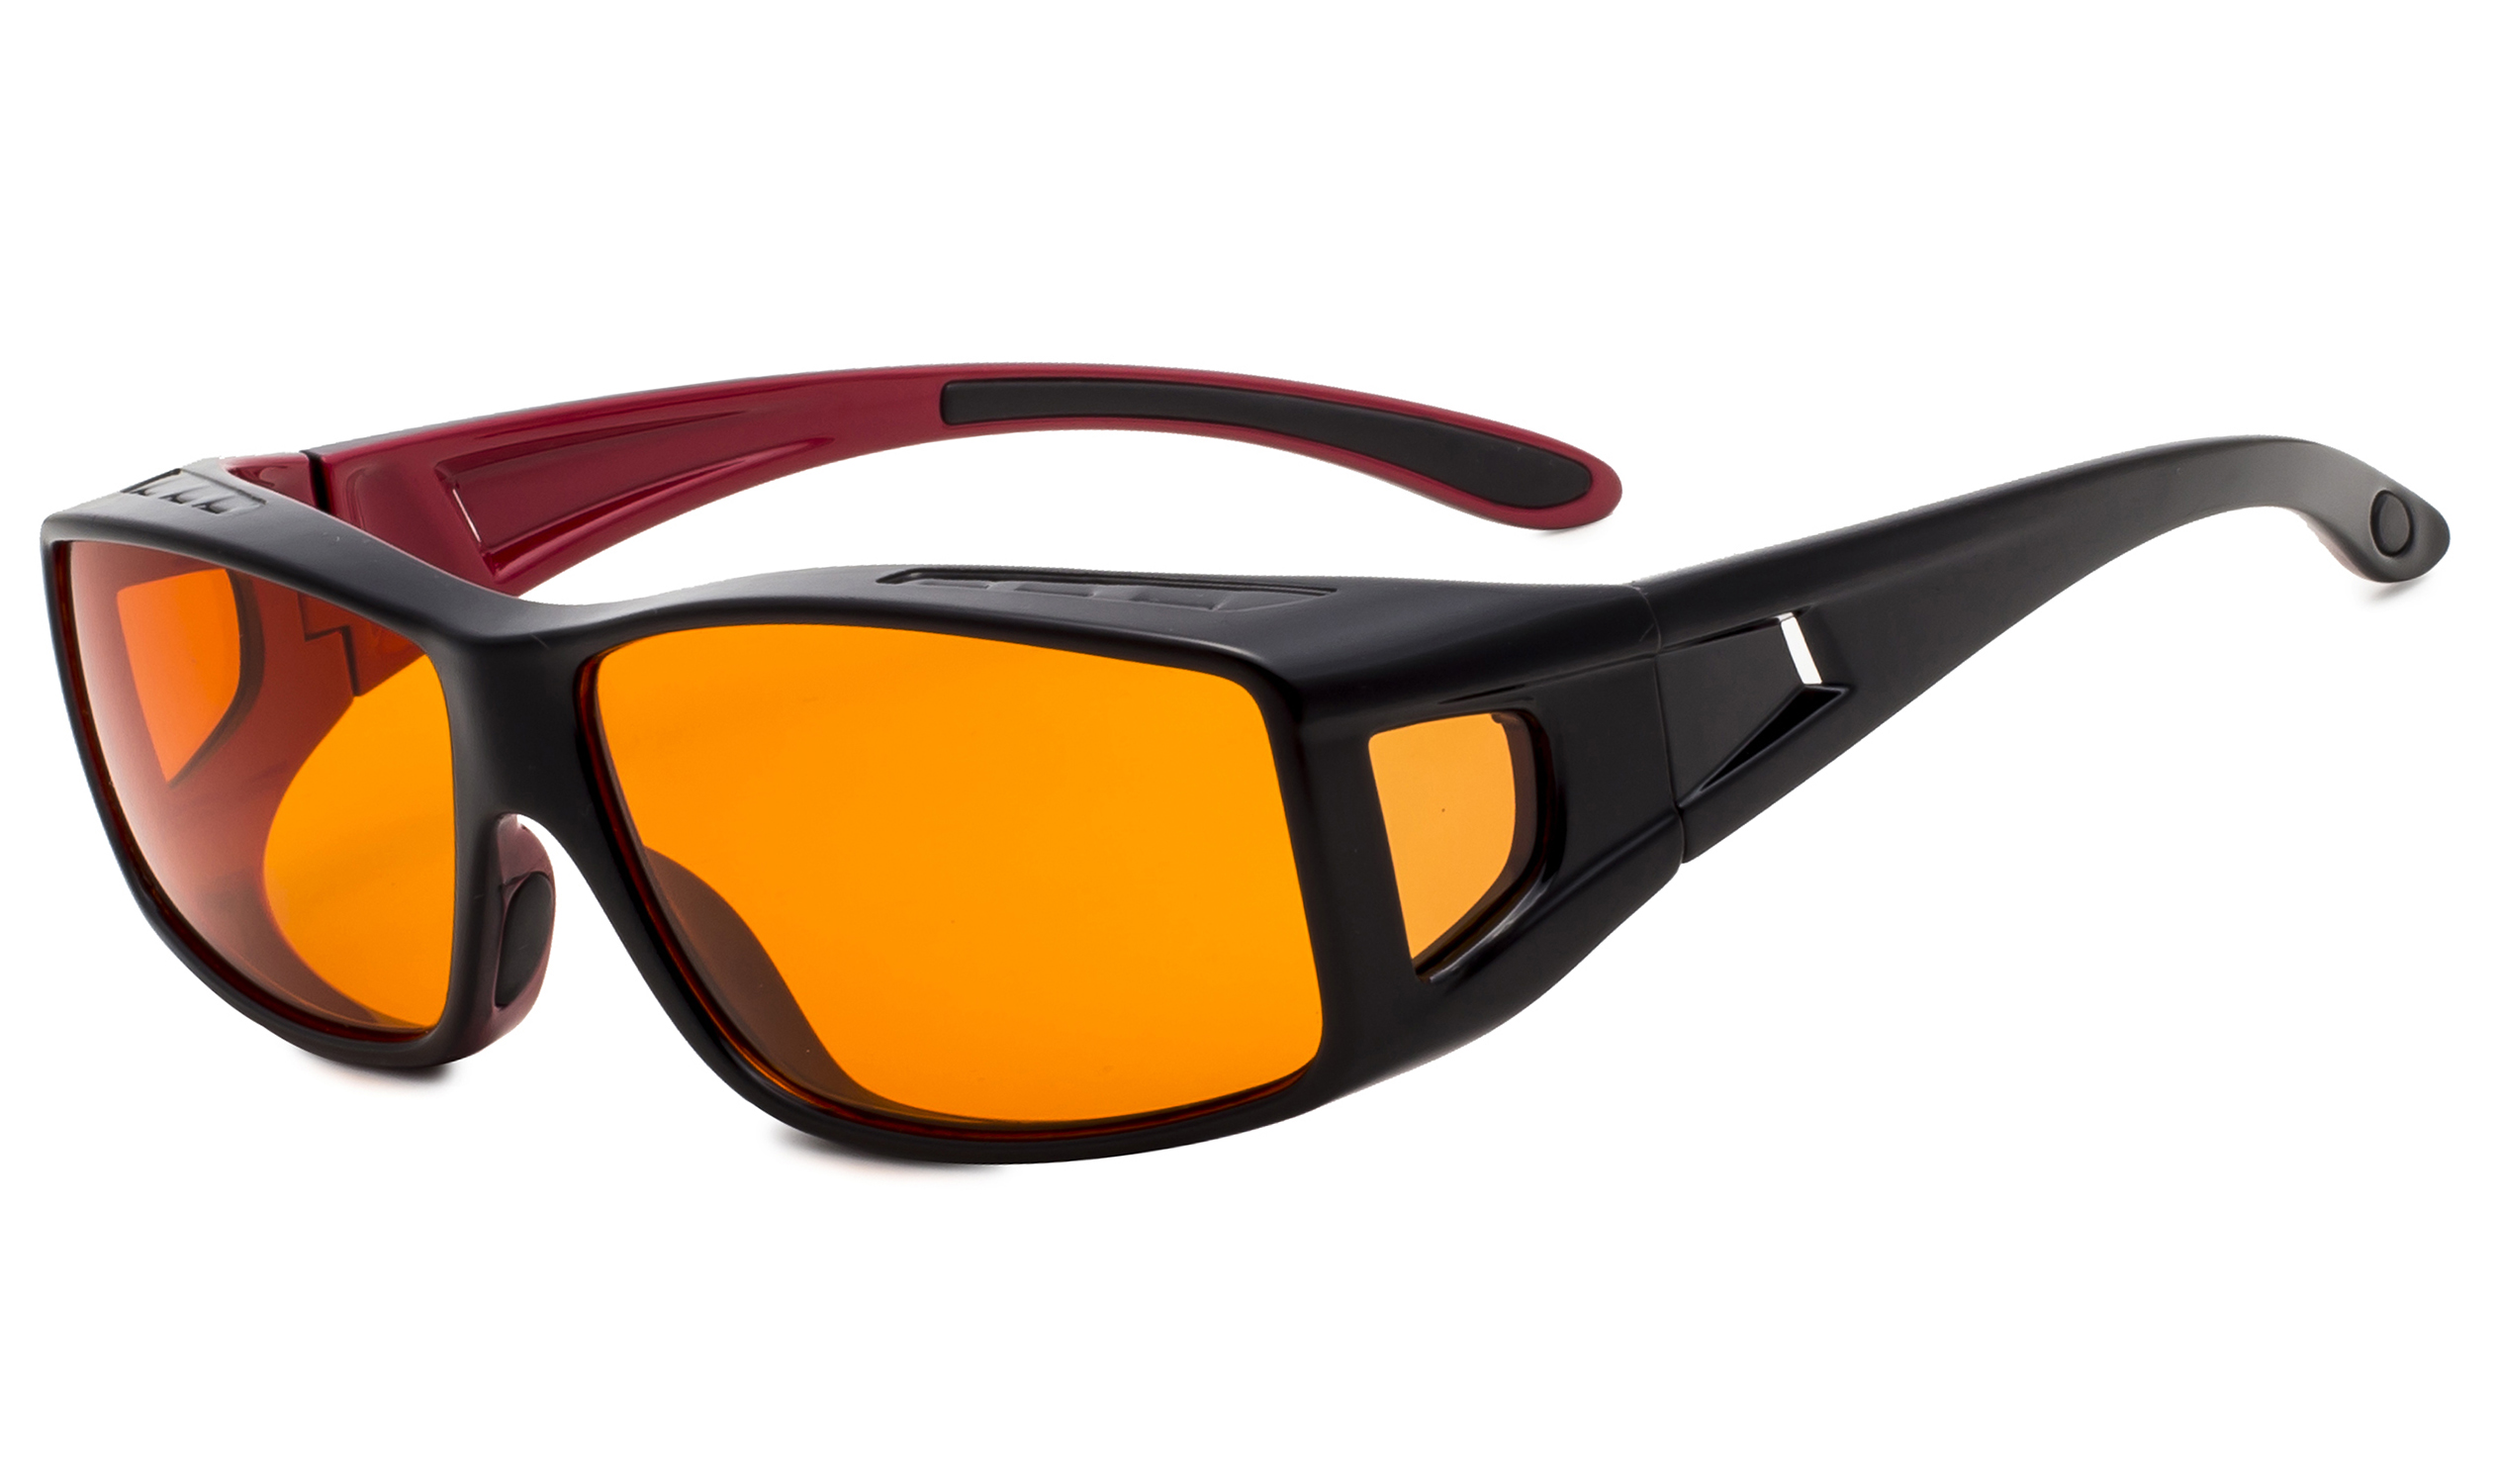 3363559f3164 Eyekepper Fit over Computer Glasses Block 100% Blue Light and Anti-UV for Sunshine  Readers Black-Red DSXM1805